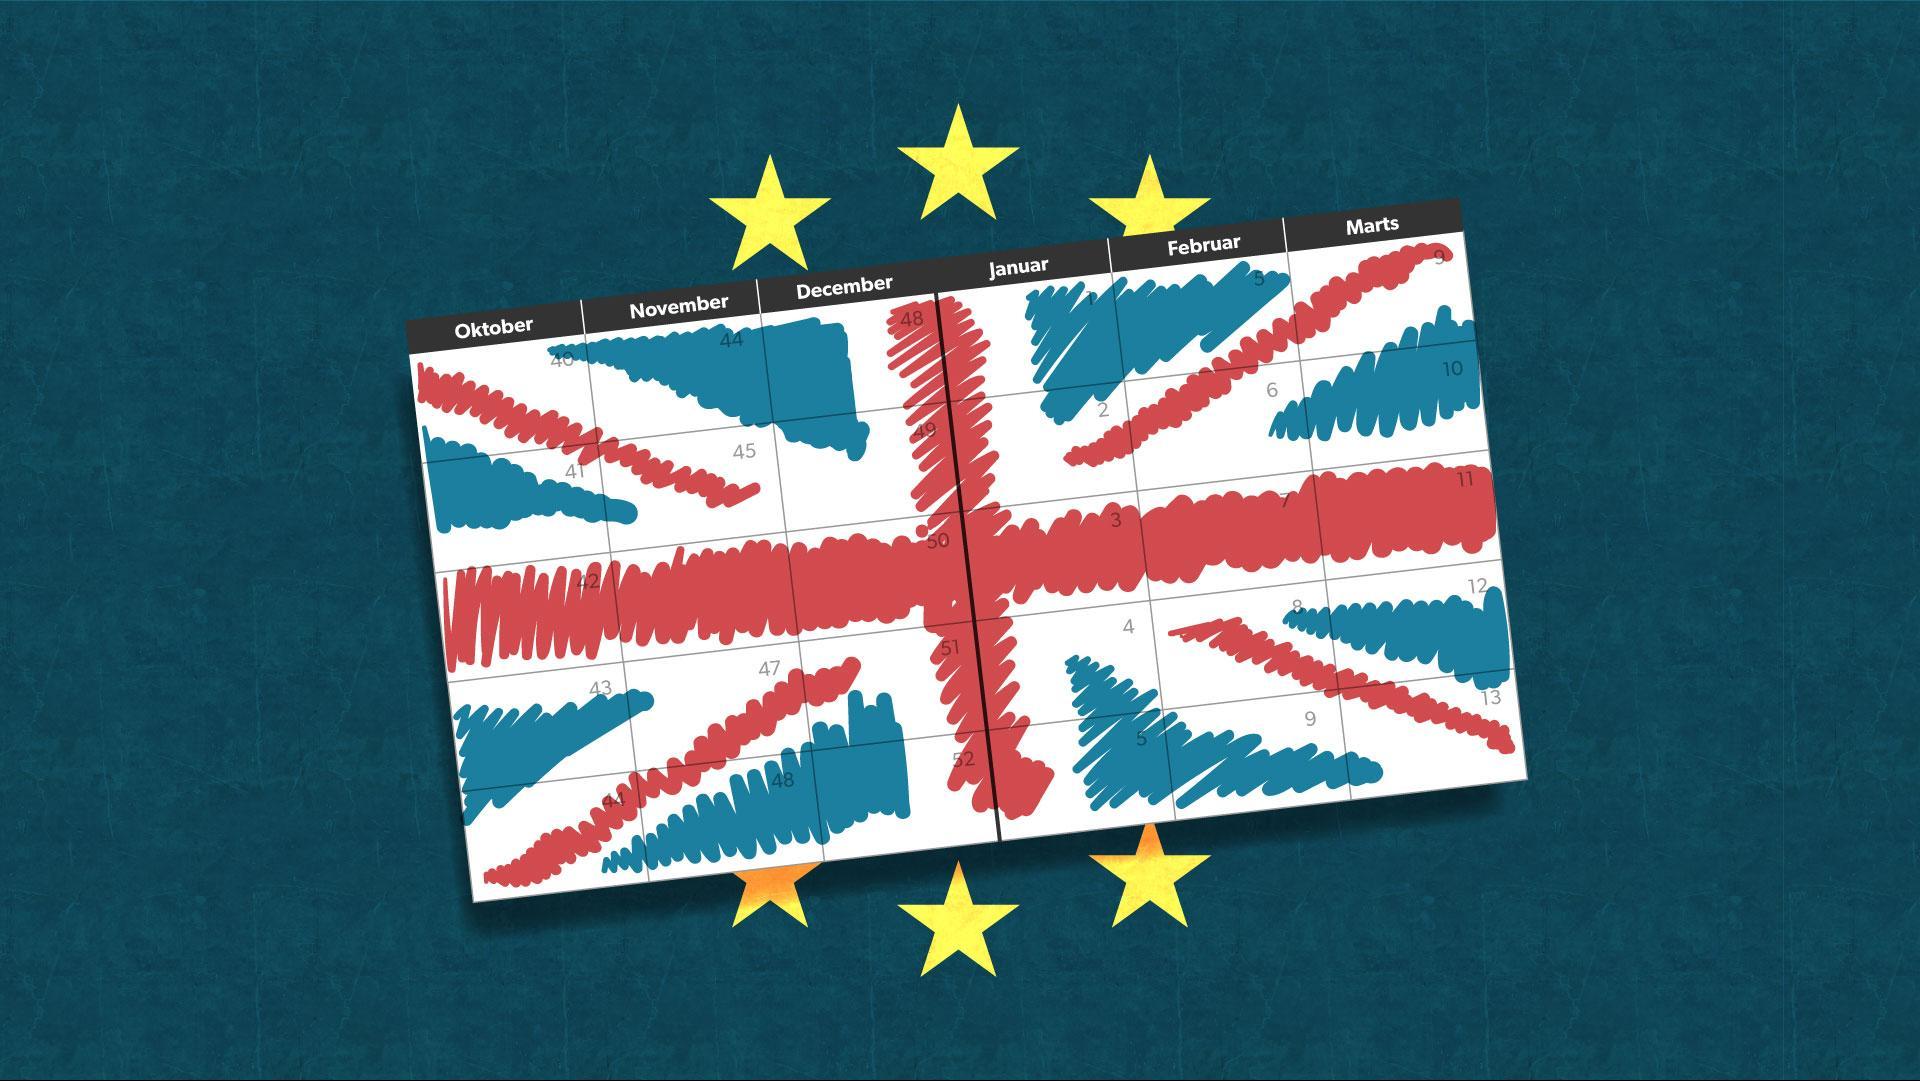 brexit-kalender-forside_0.jpg